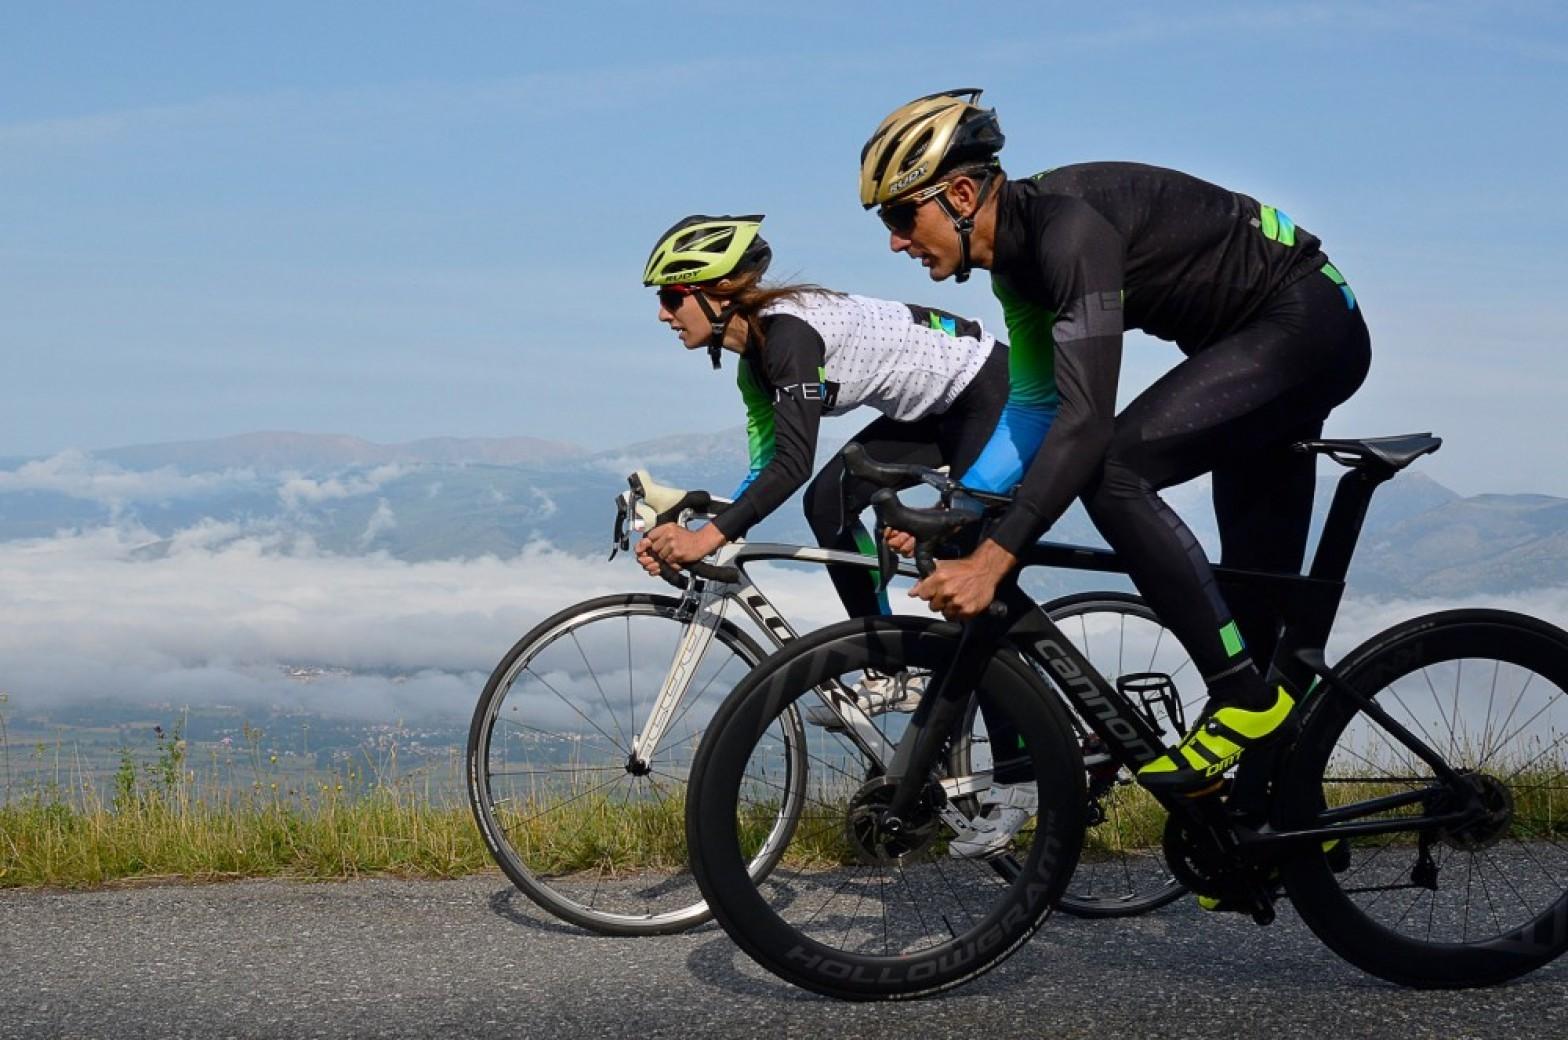 ropa-ciclismo-mountain-bike-invierno-frio/